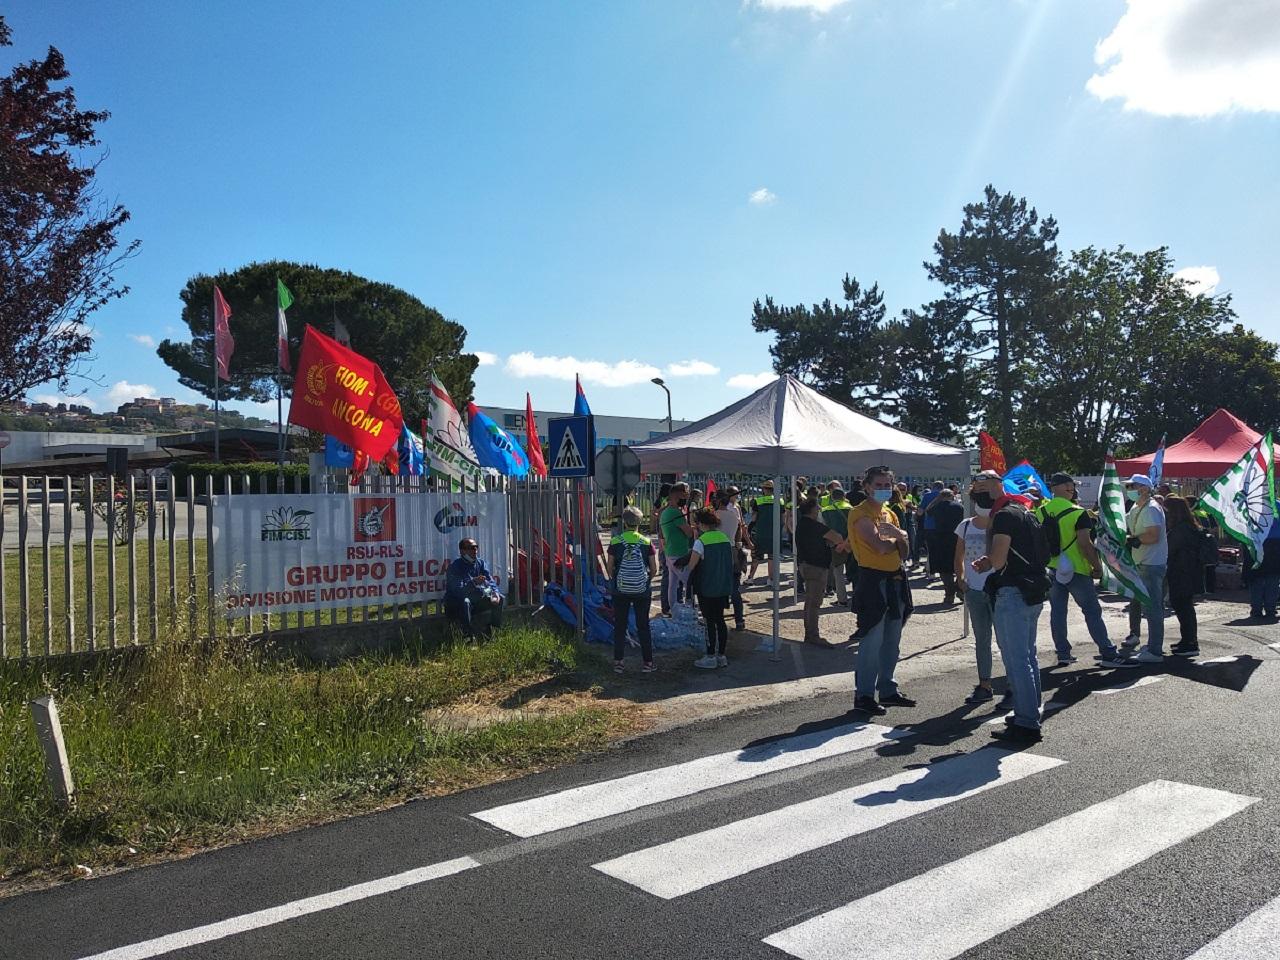 La manifestazione a Castelfidardo